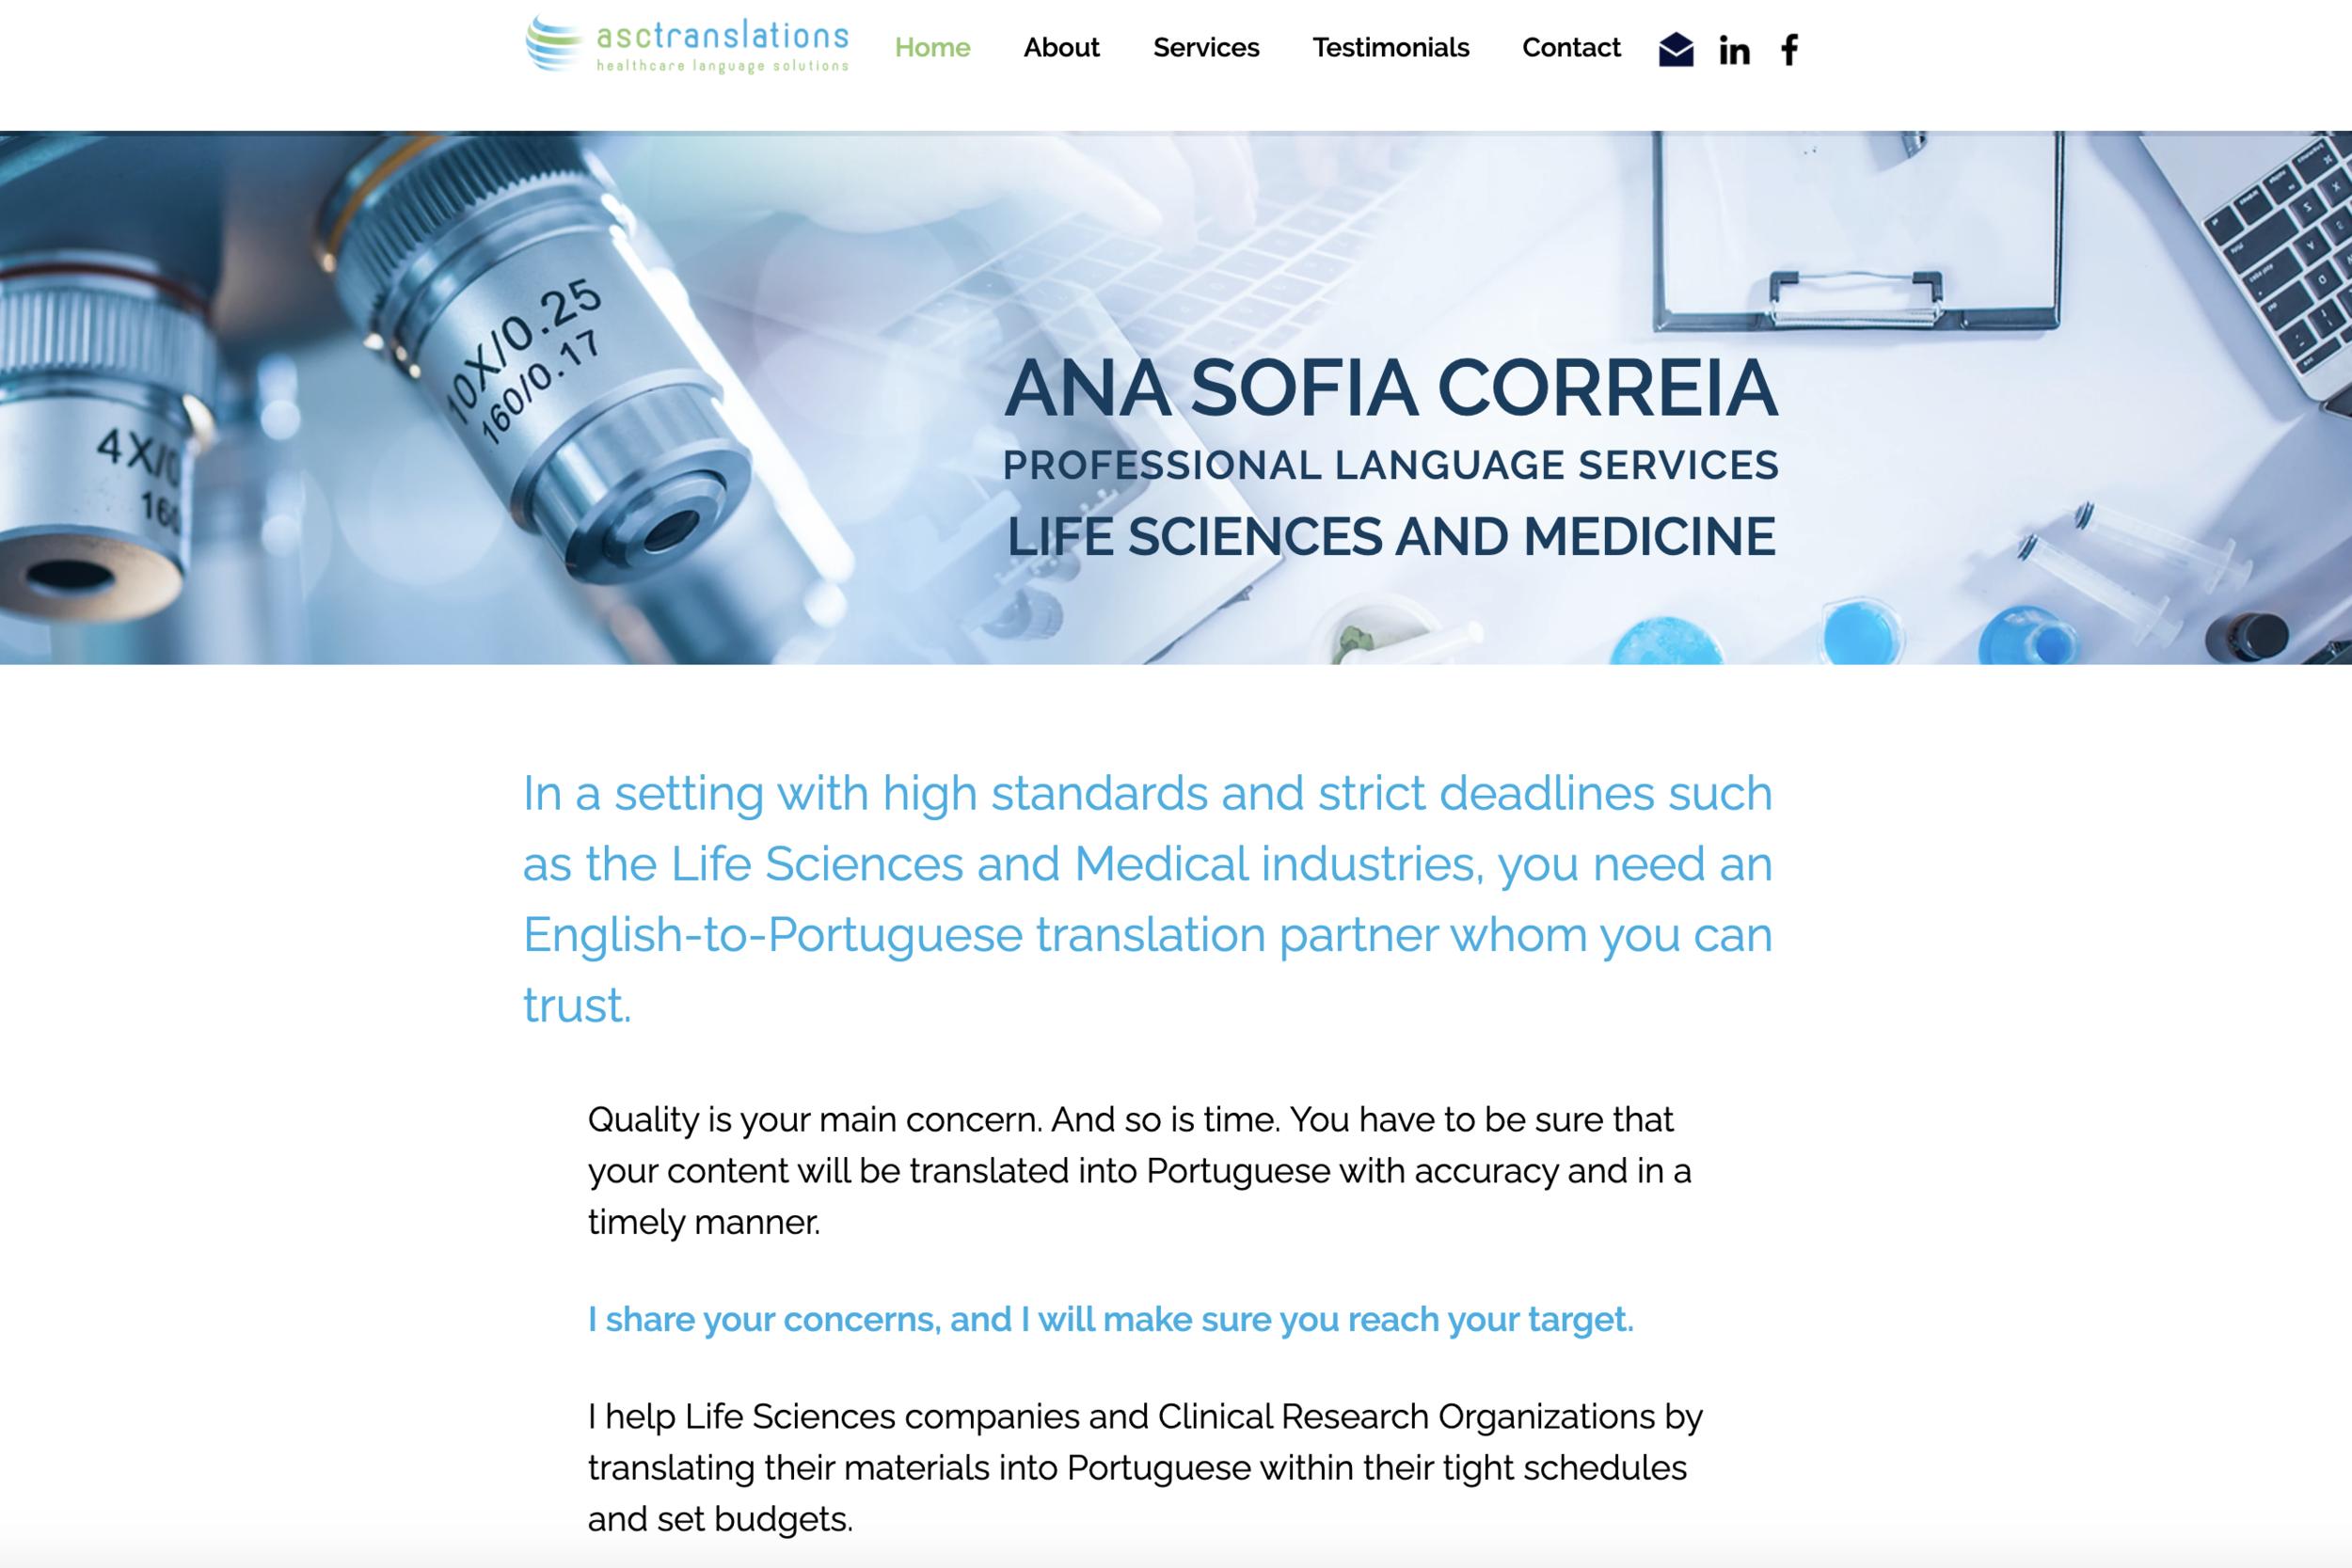 website copywriting tips for translators.png